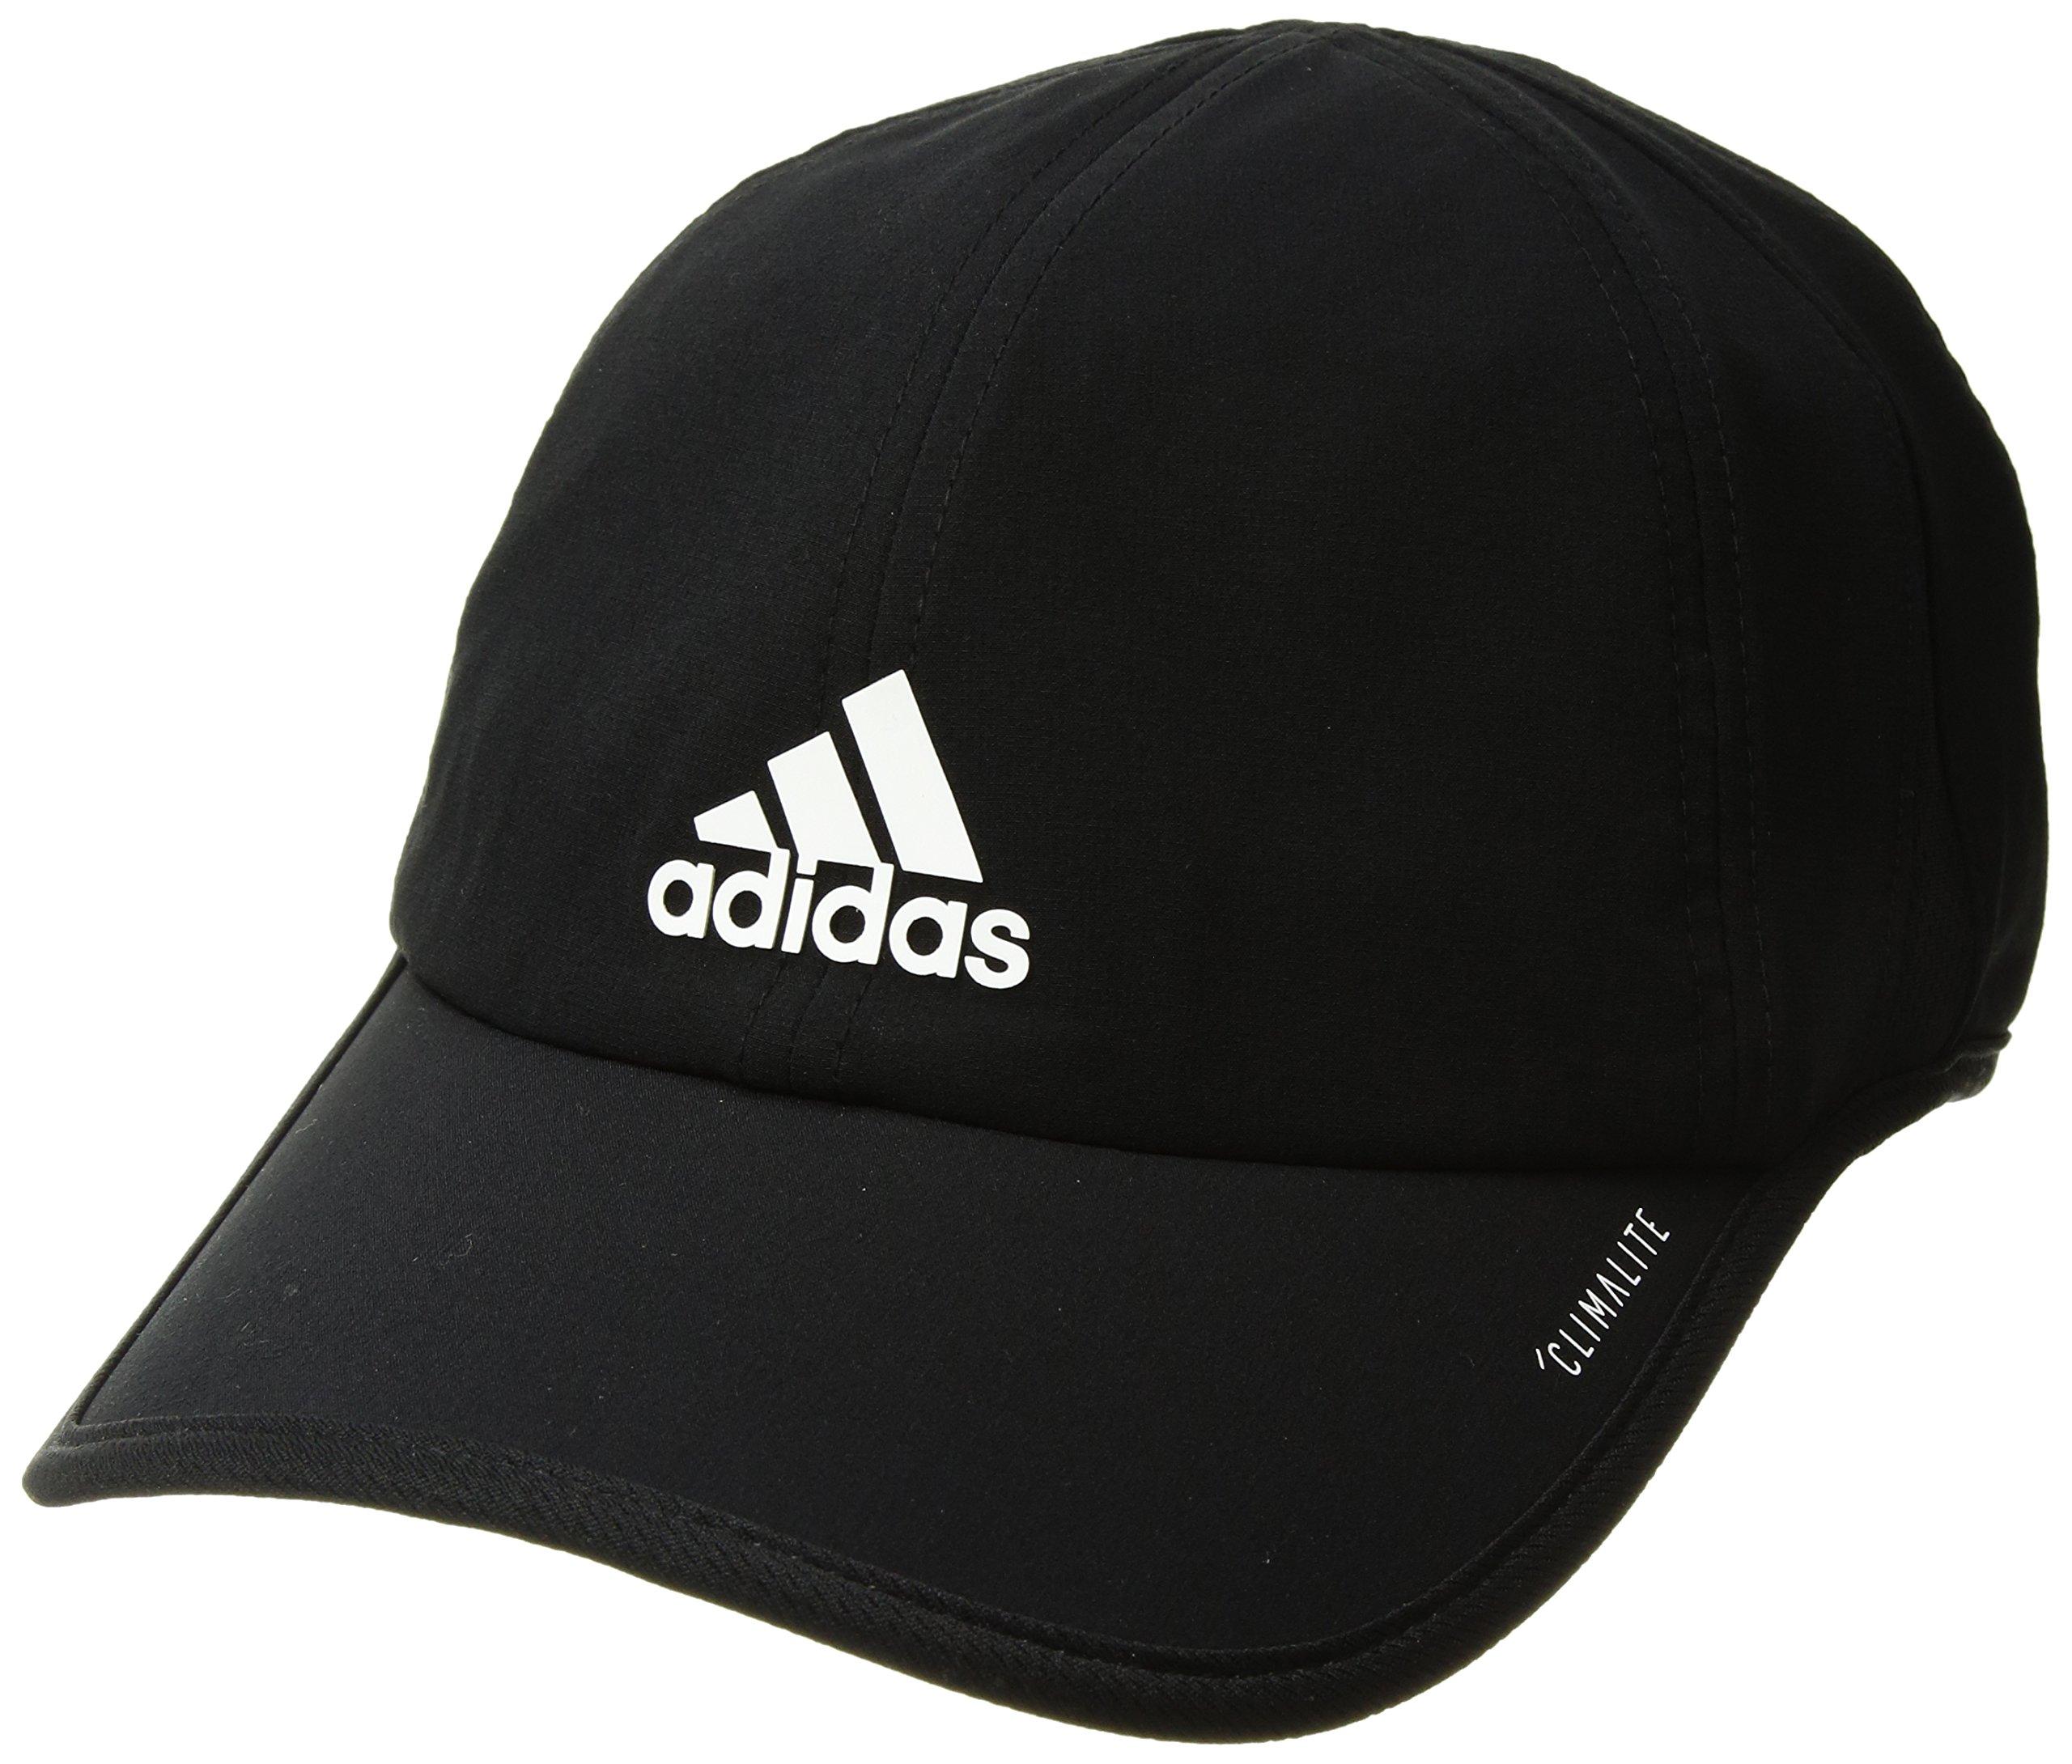 adidas Men's Superlite Cap, Black/White, ONE SIZE by adidas